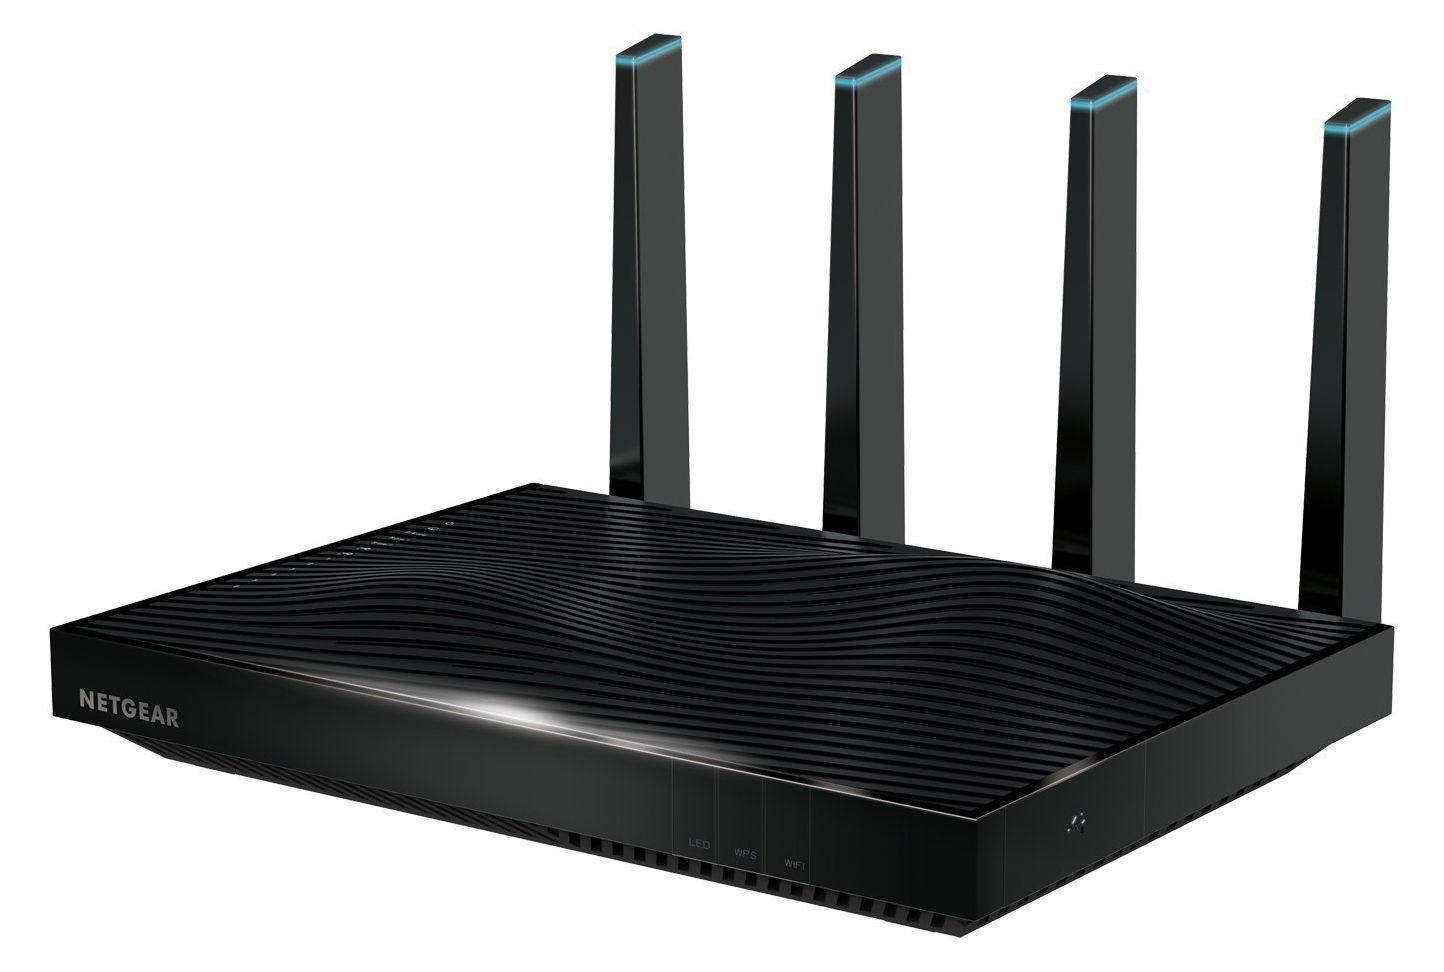 Netgear R8500 5300 Mbps 6-Port Gigabit Wireless AC Router (R8500-100NAS)